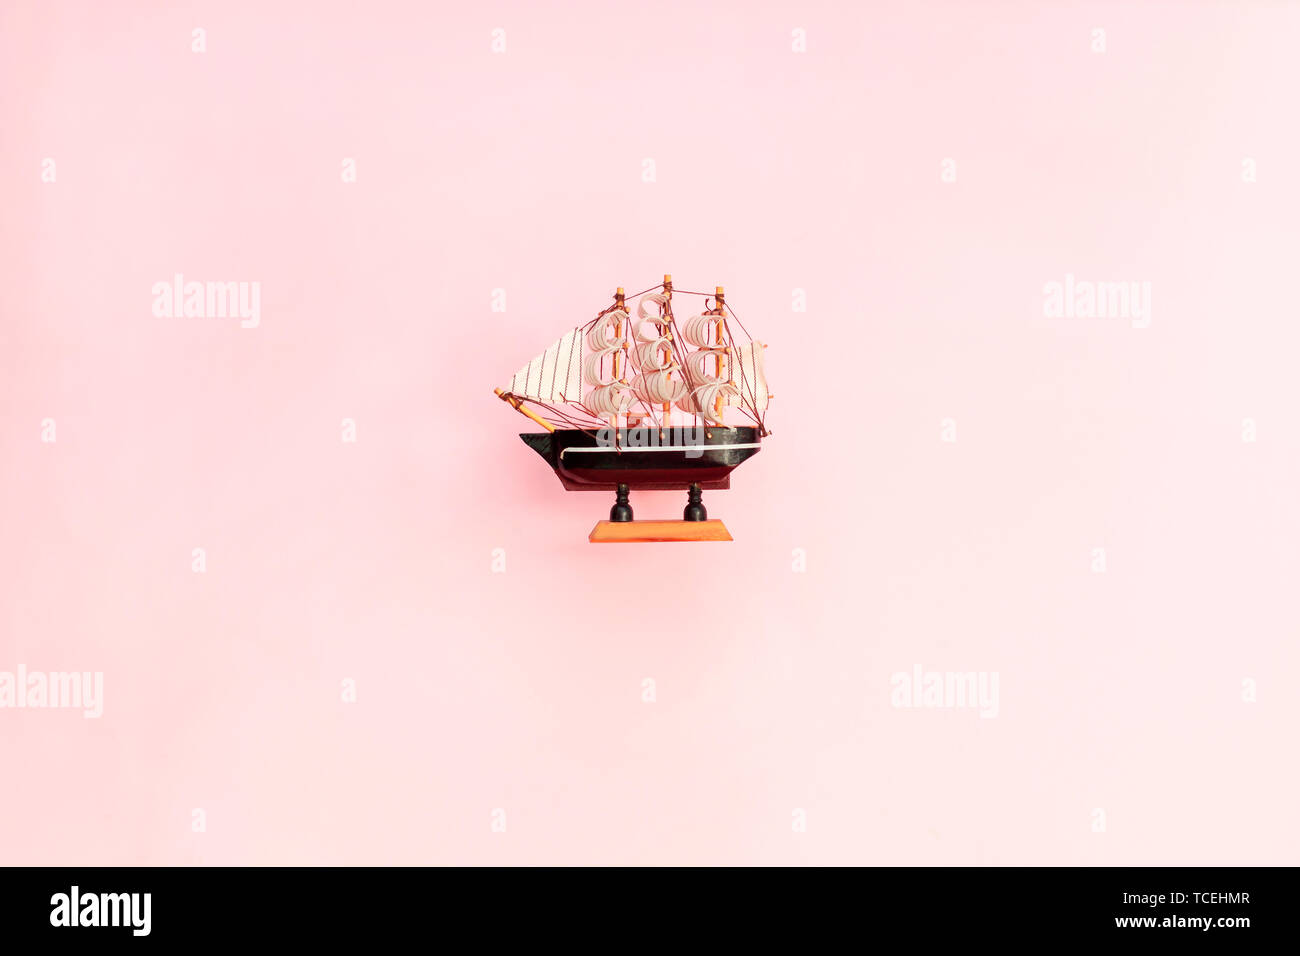 Pequeño Fondo Sobre De Madera Barco Color RosaVelero Juguete wknXZPN80O